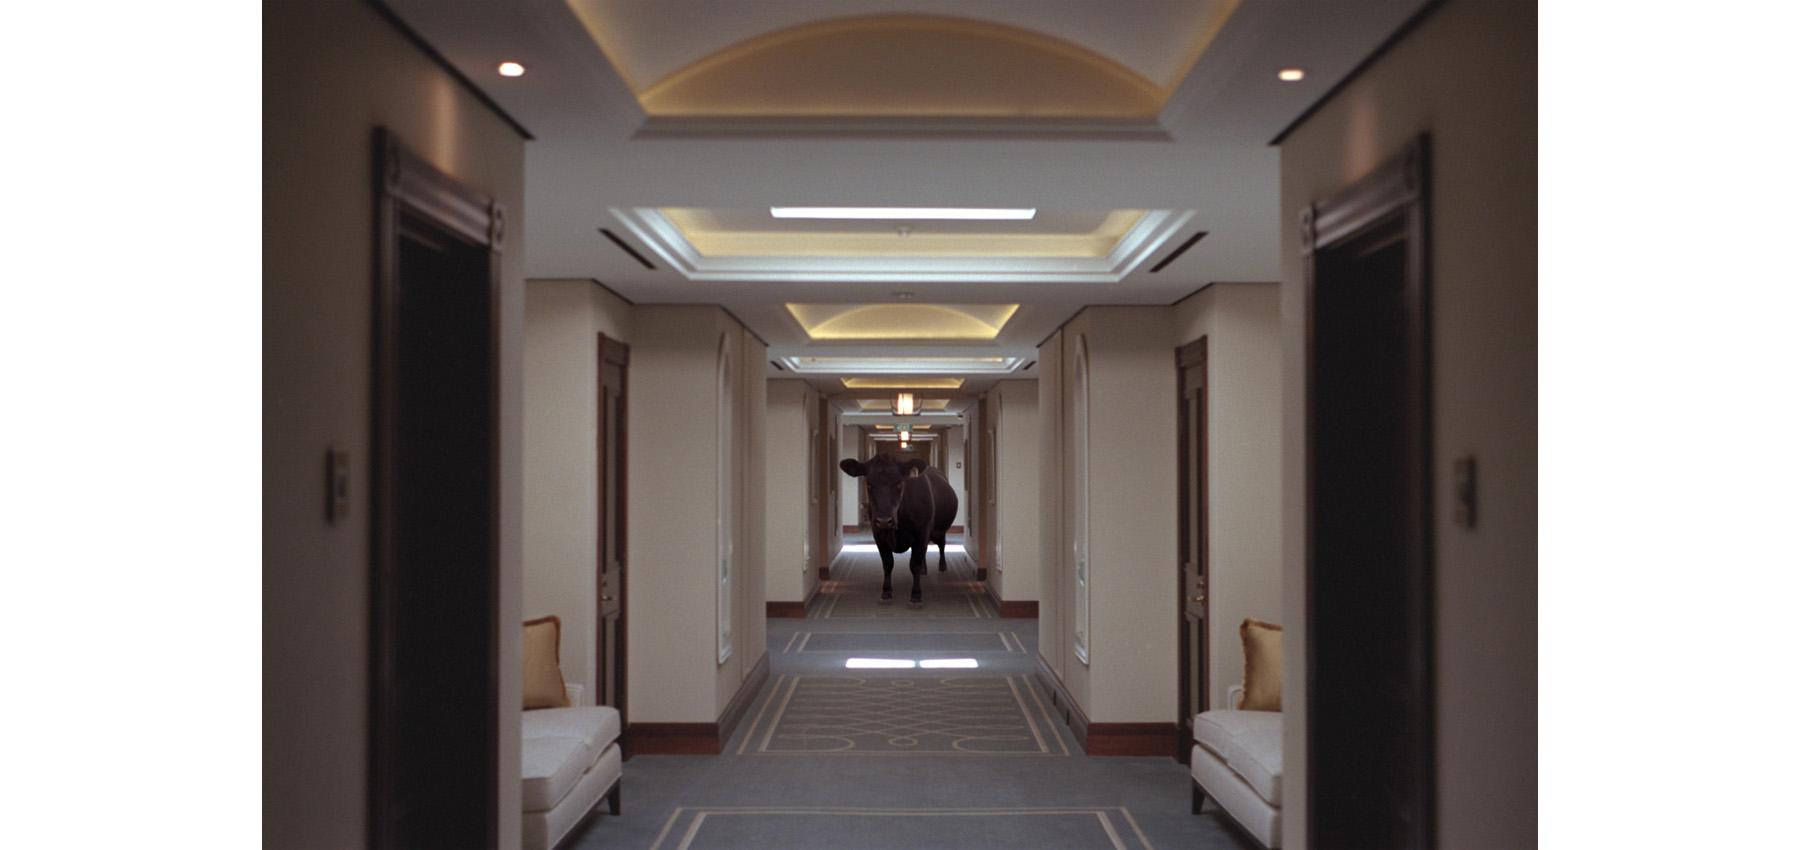 161000 hotel3 sq.jpg